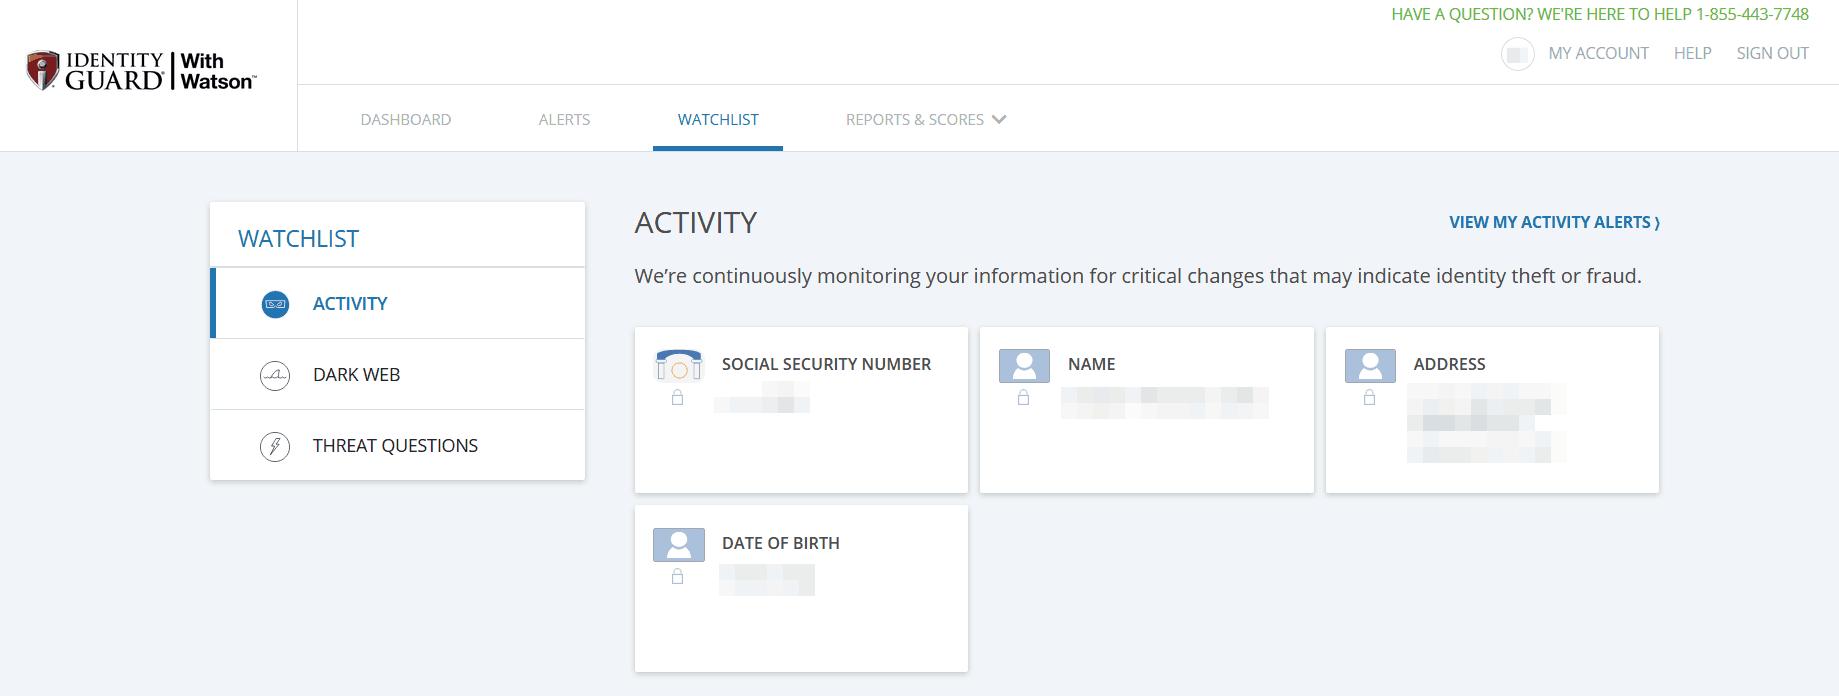 Identity Guard Watchlist Screen